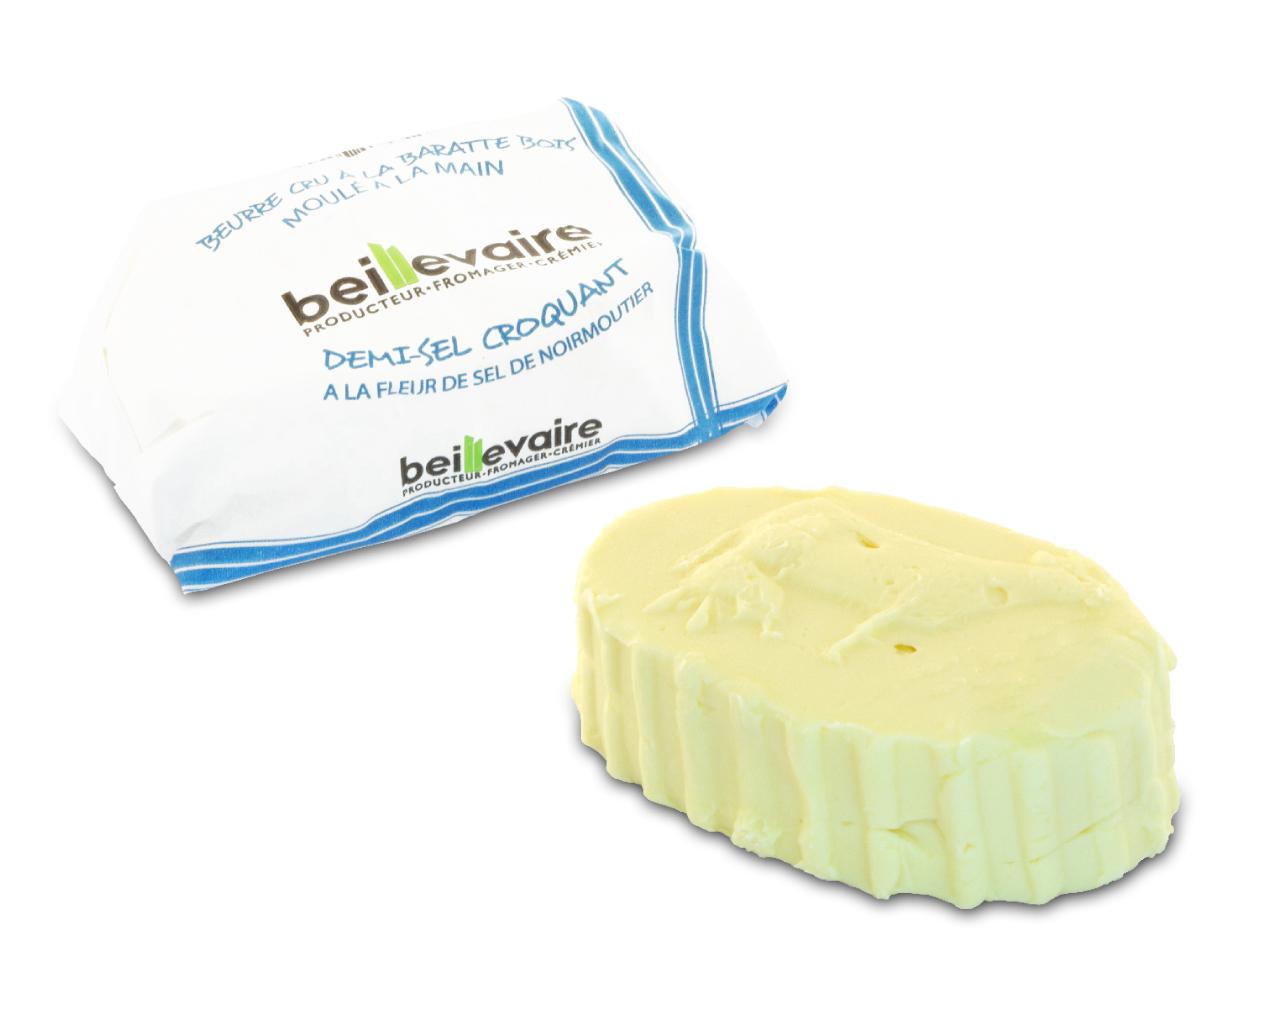 Beurre artisanal cru demi-sel croquant, Beillevaire (125 g)